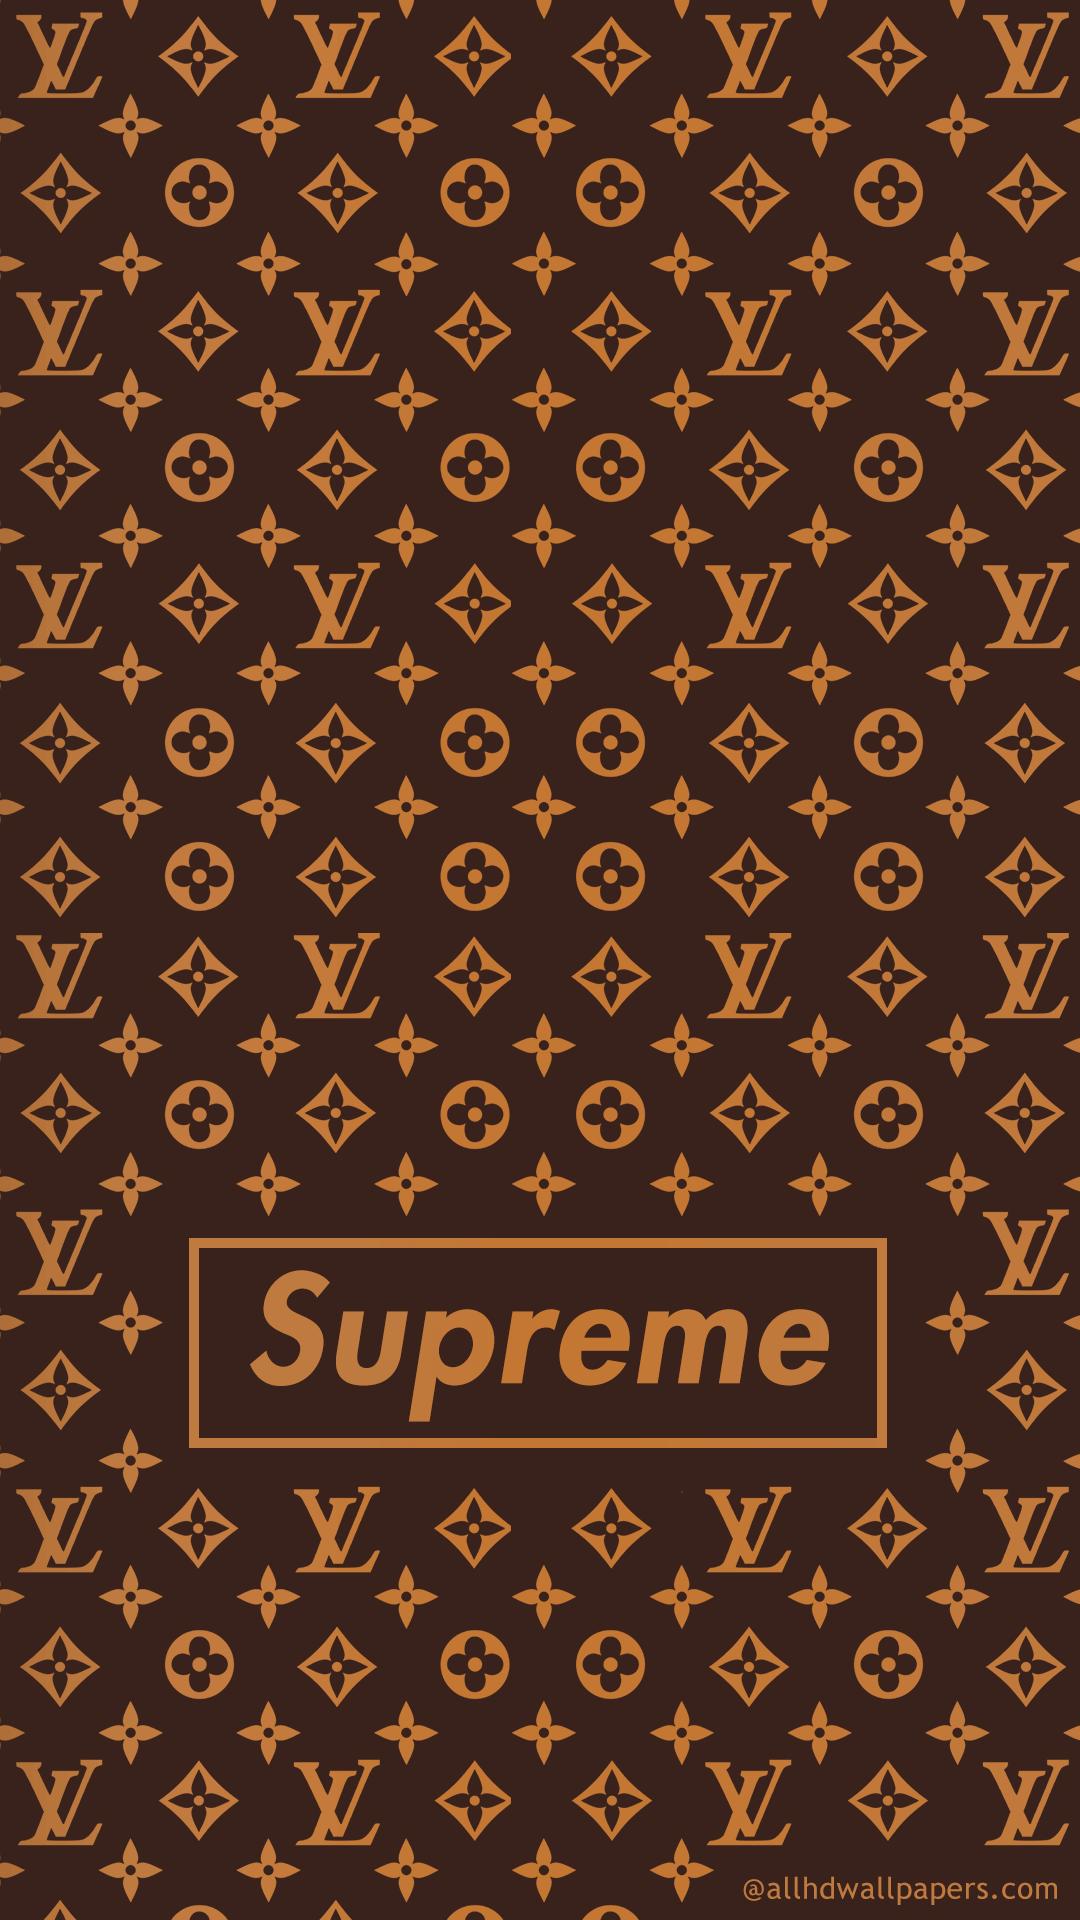 Free Download 70 Supreme Wallpapers In 4k Allhdwallpapers